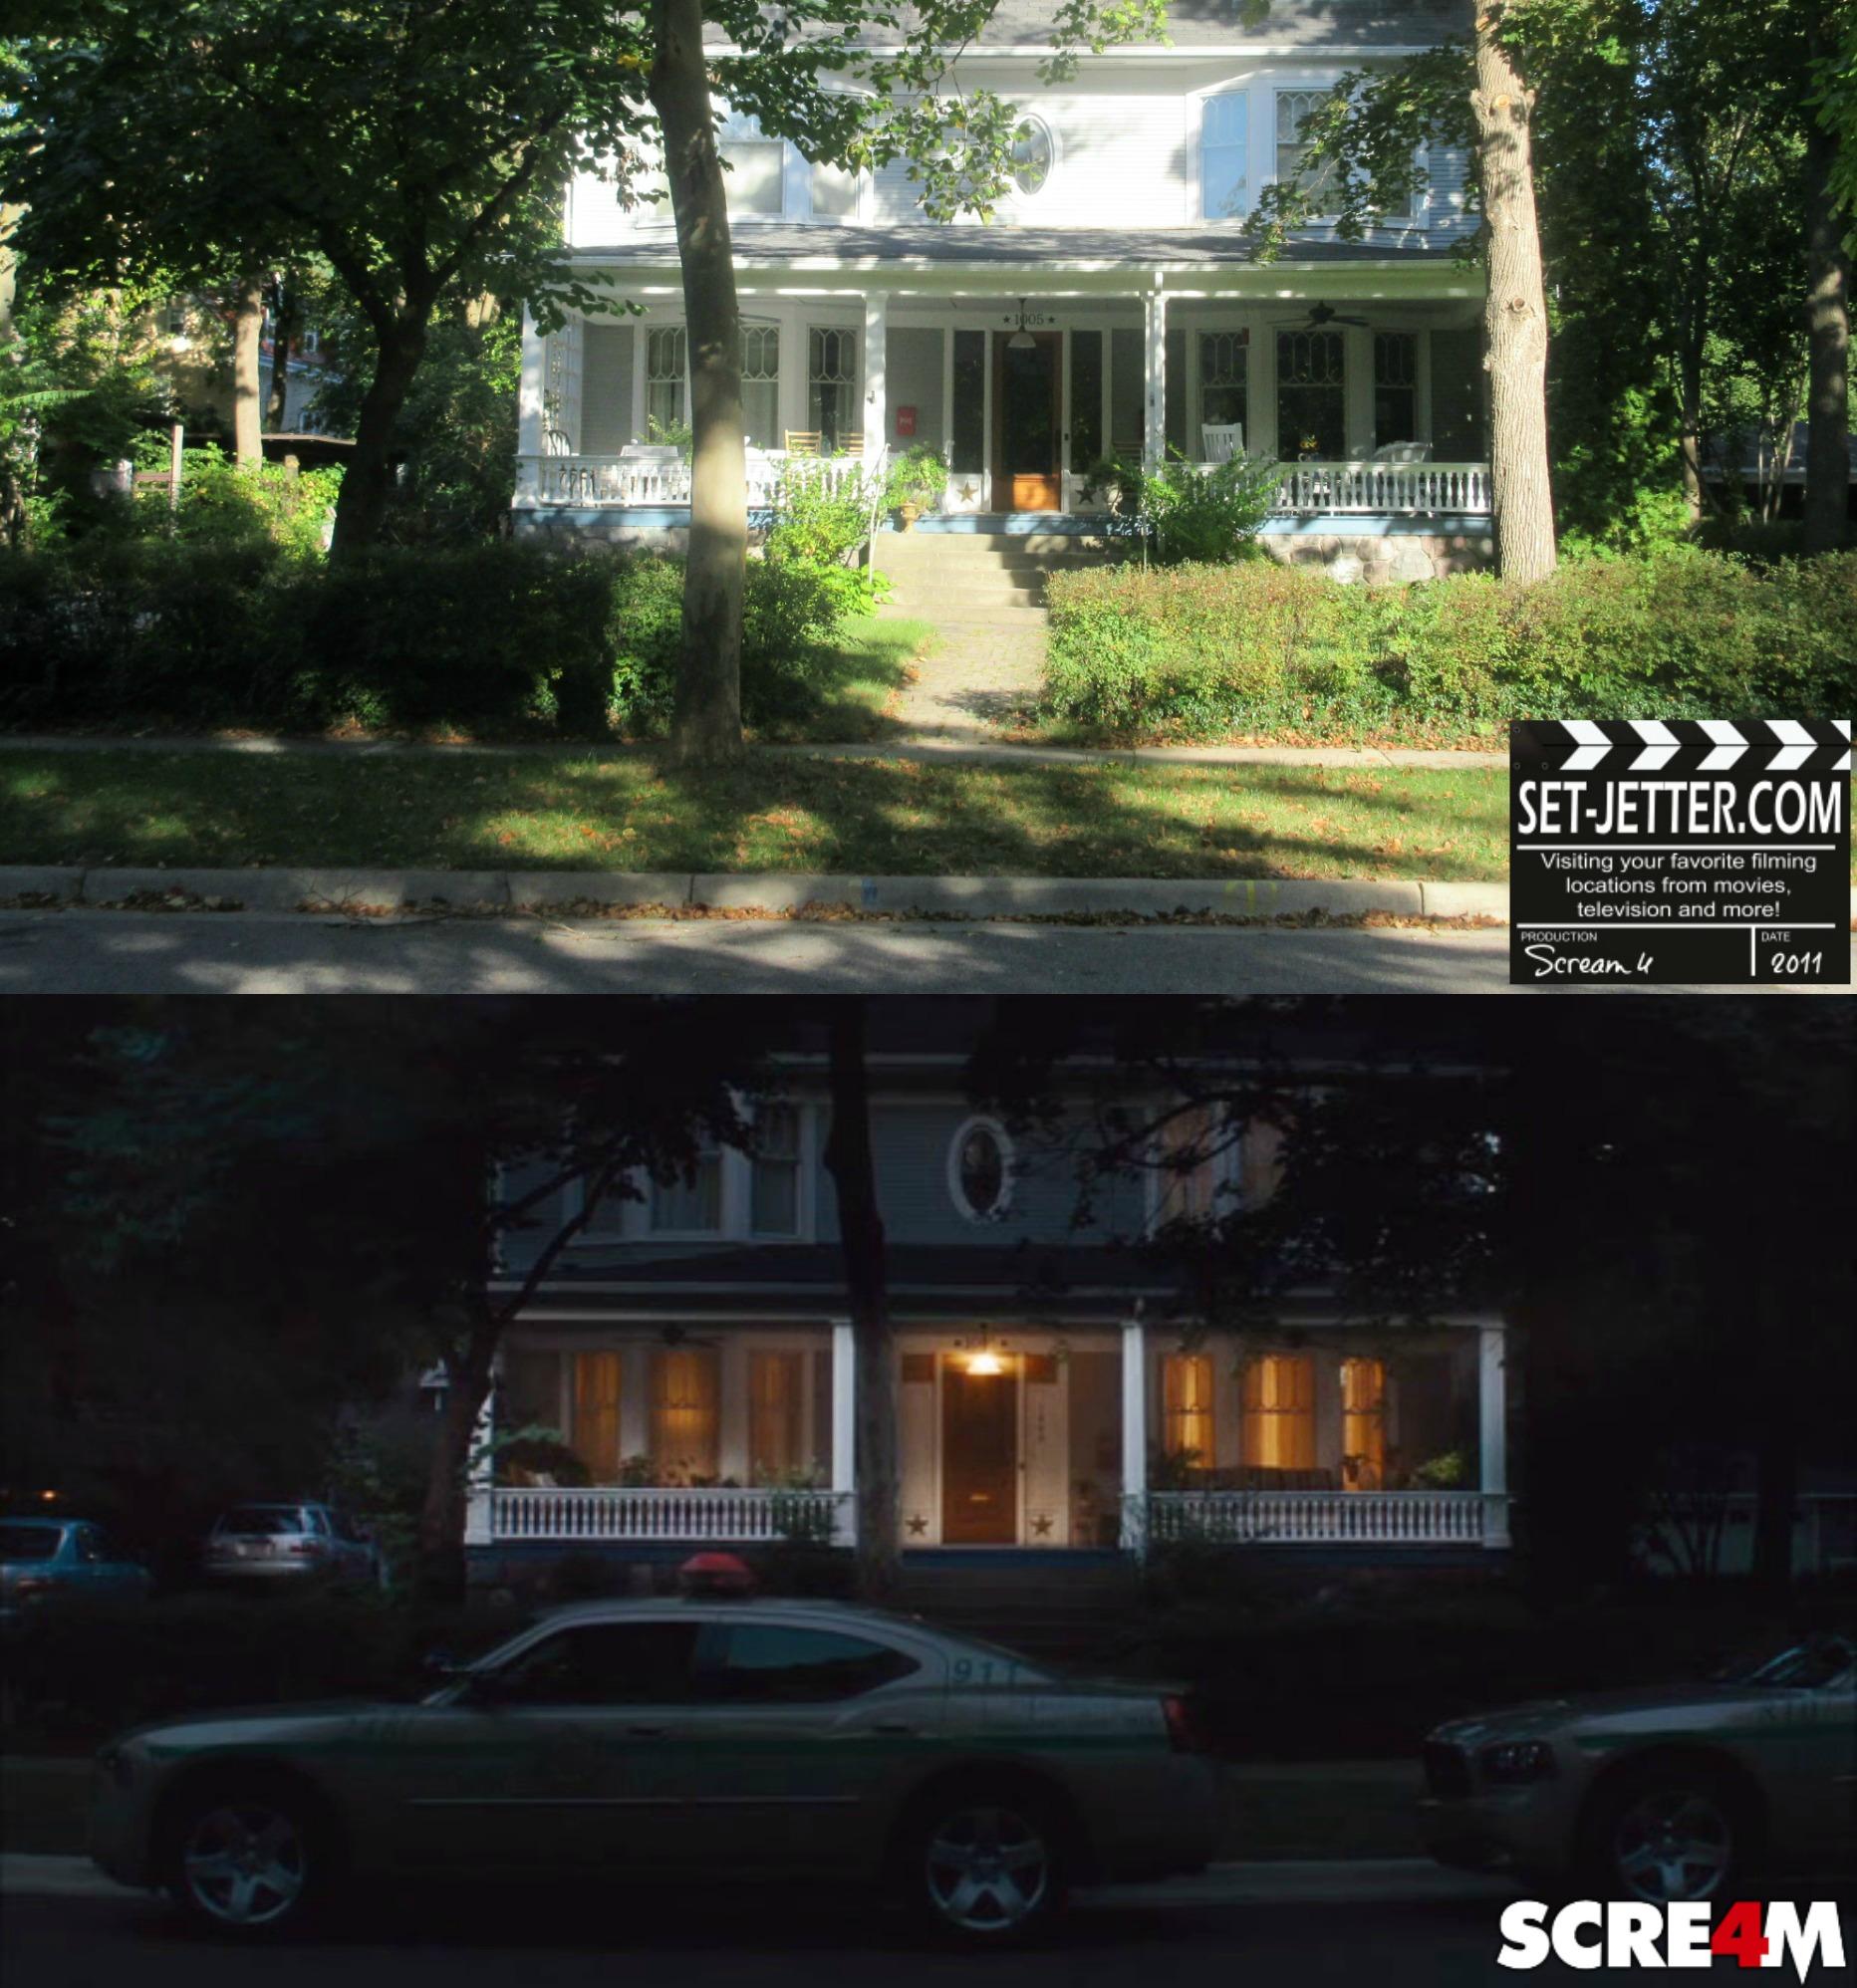 Scream4 comparison 108.jpg